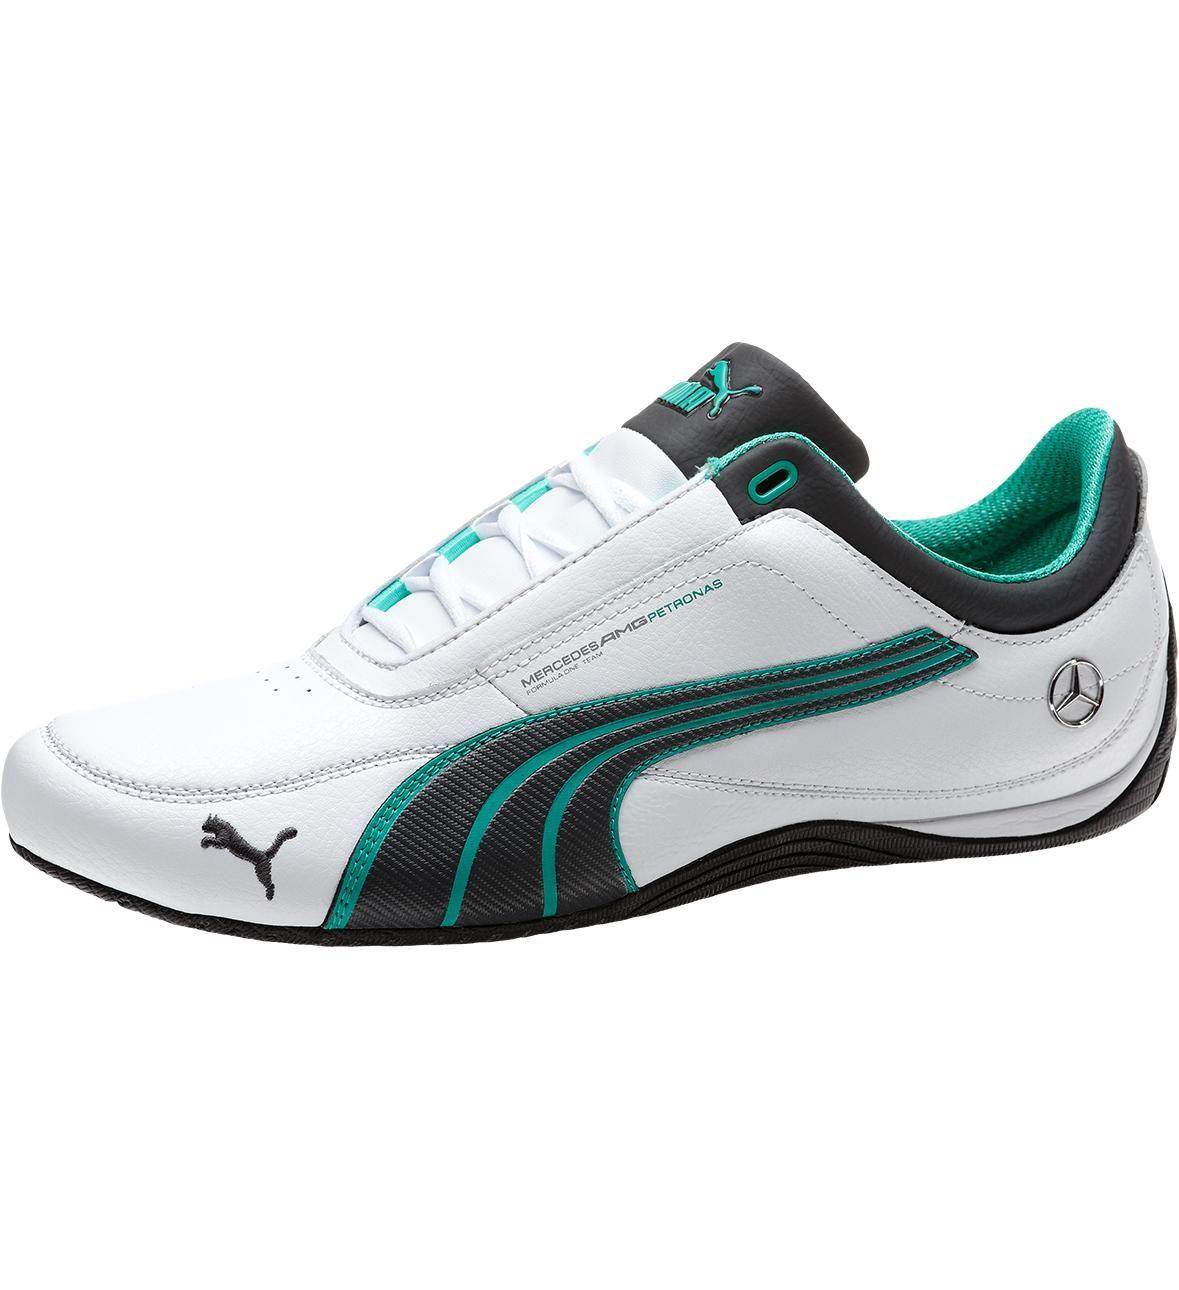 Puma shoes puma mercedes drift cat iv shoes wish list for Puma mercedes benz